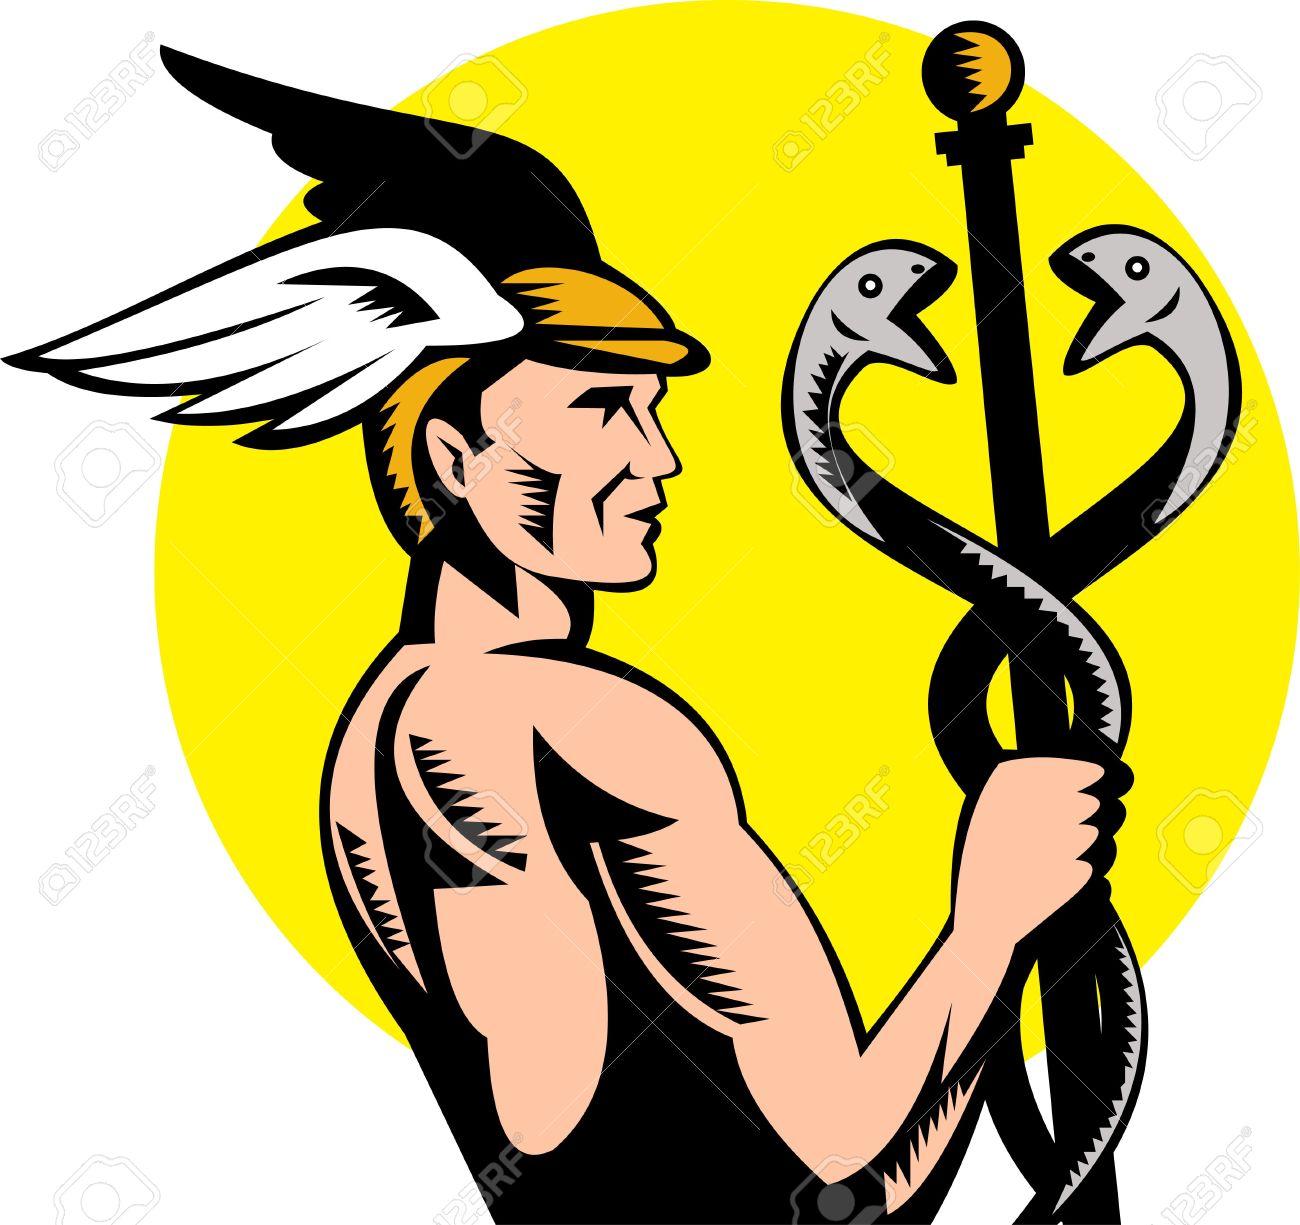 Uncategorized Hermes God illustration of roman greek god hermes or mercury holding a caduceus stock 6233958